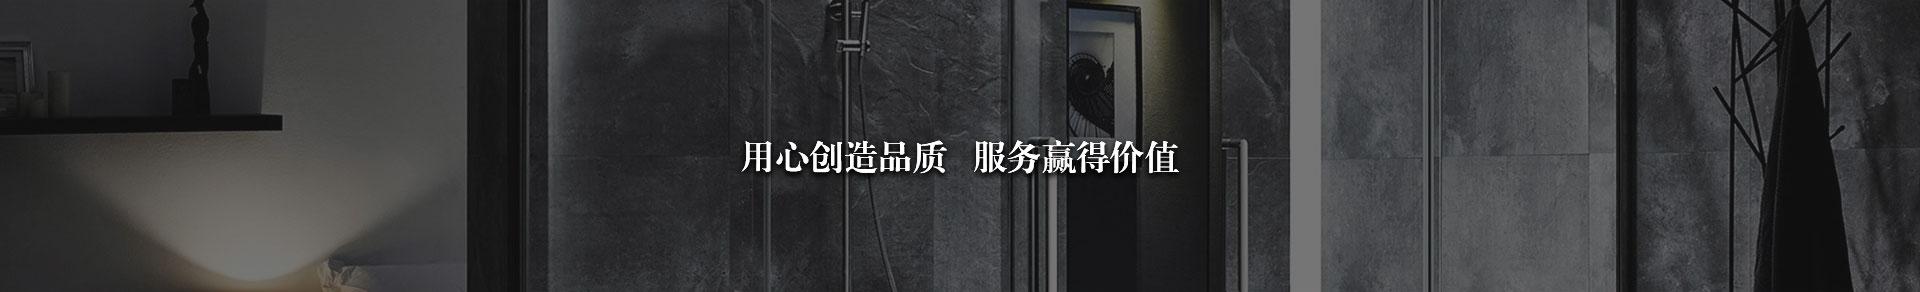 http://cn86-demo.oss-cn-hangzhou.aliyuncs.com/demo/905eb14aabyhrvuq.jpg